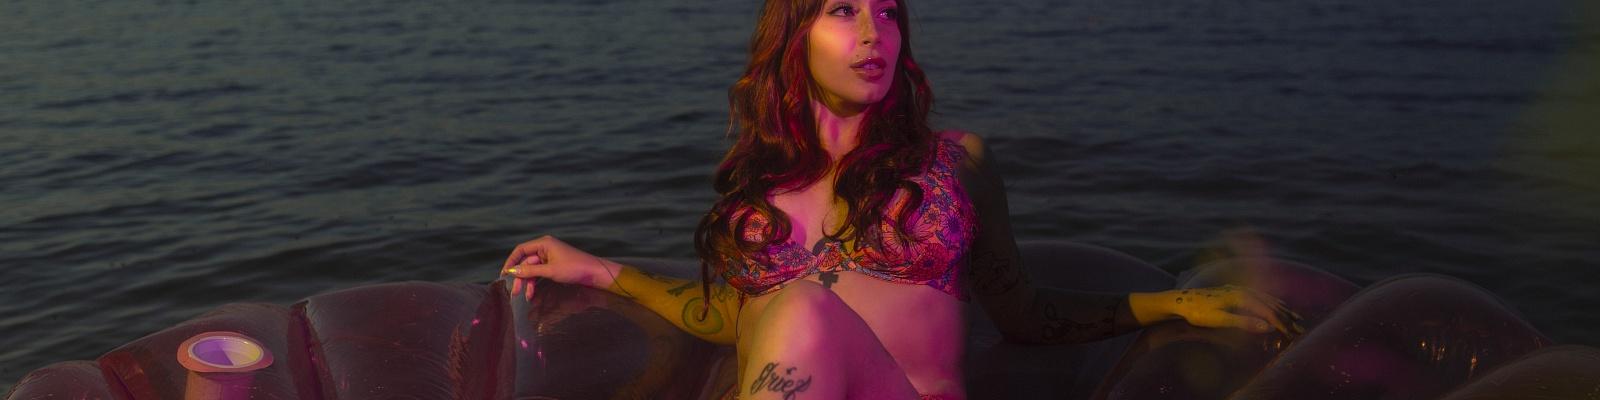 Zoya Ferrante's Cover Photo